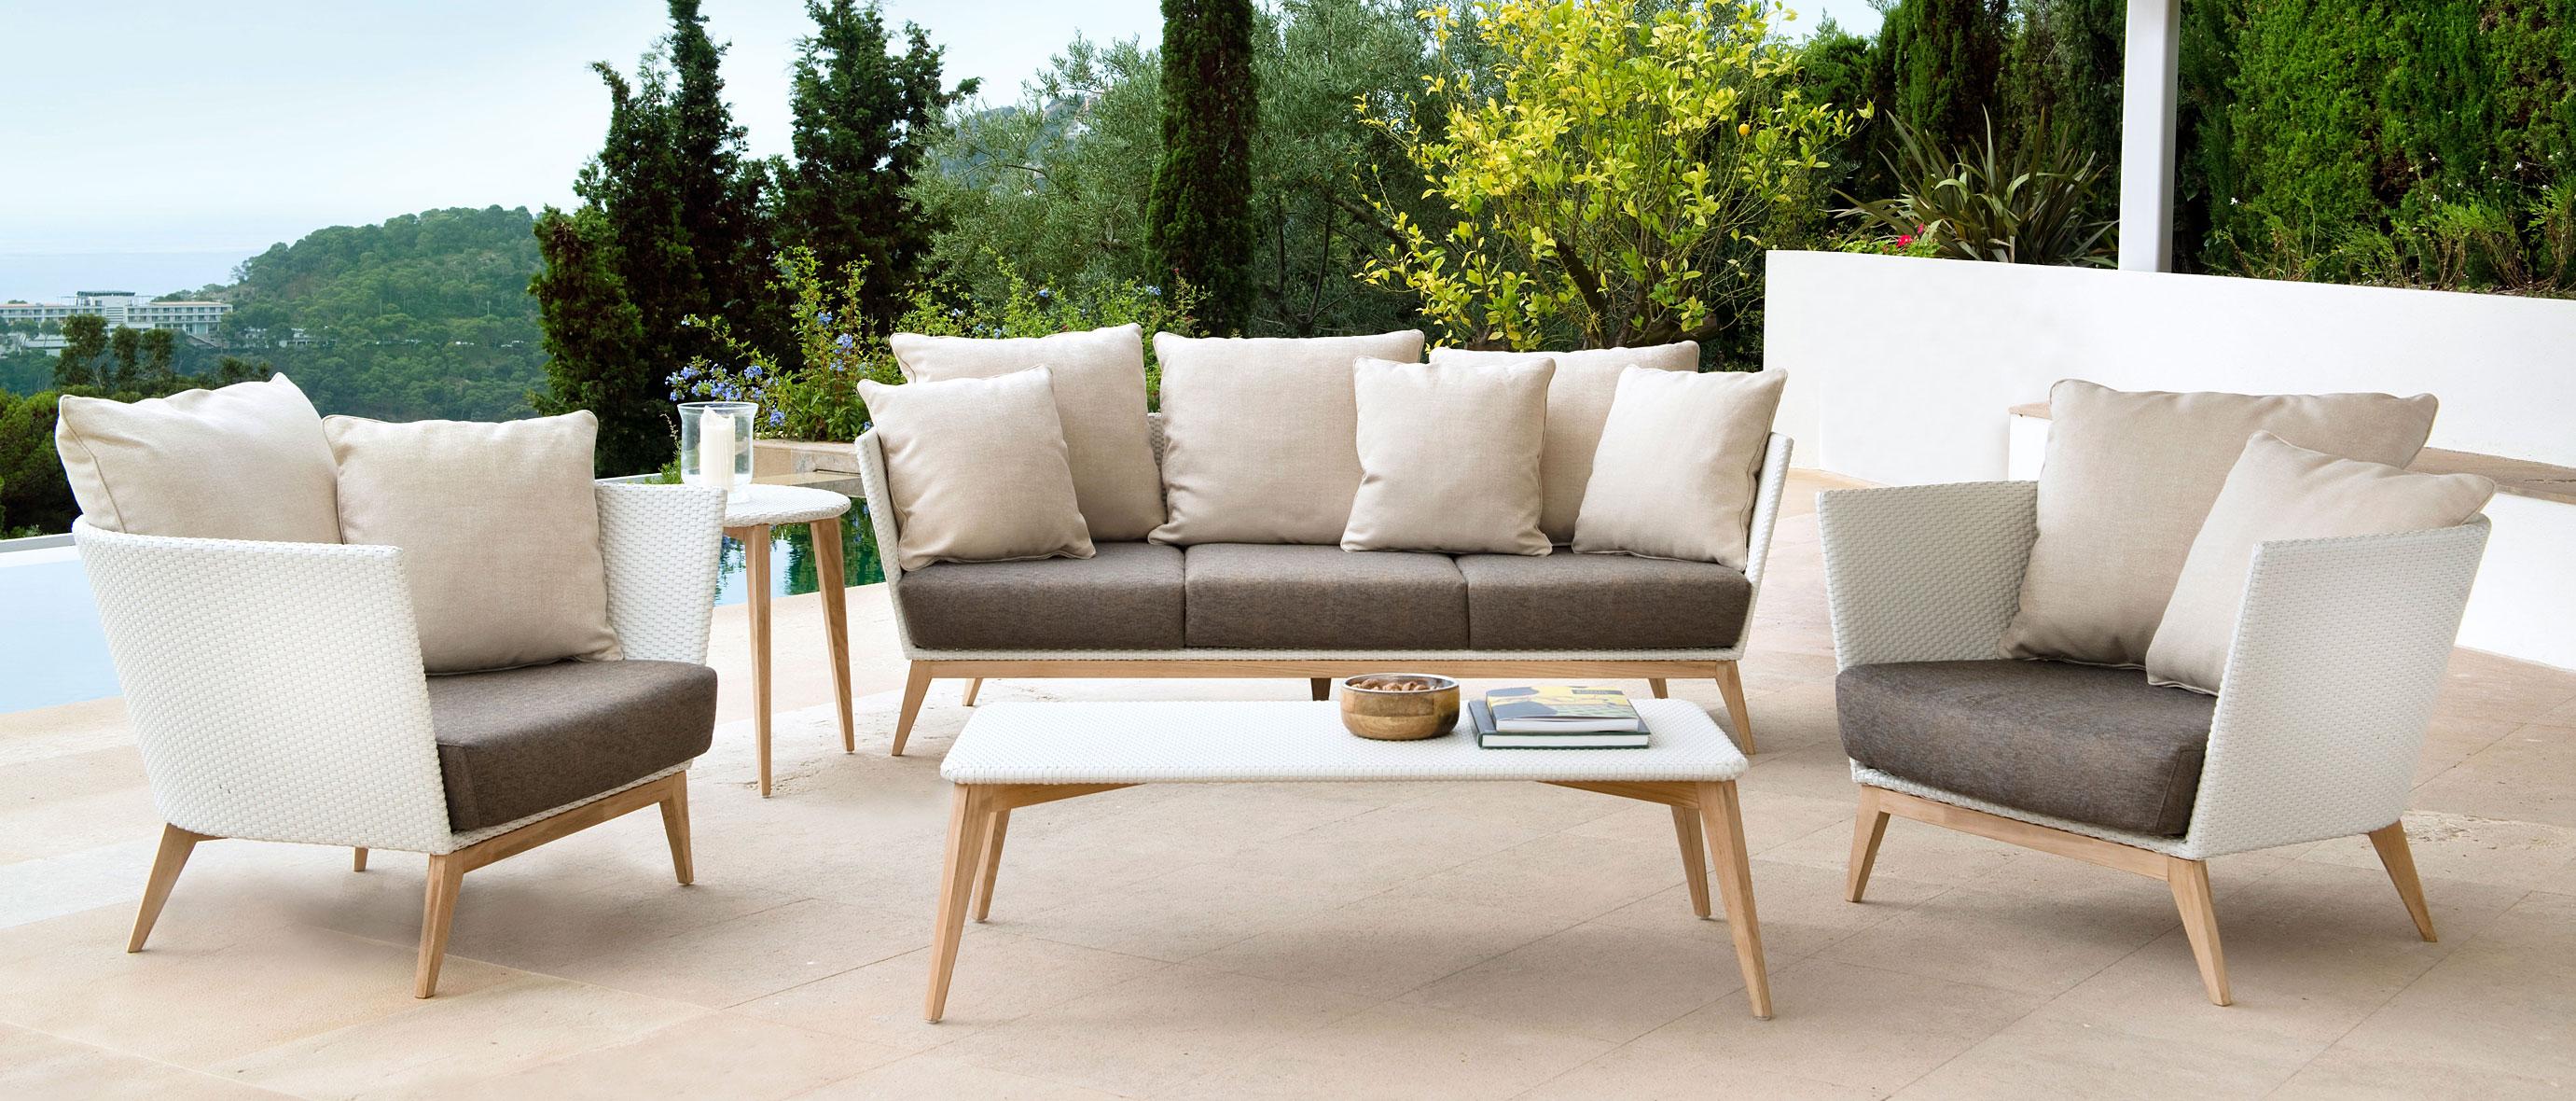 Muebles salon jardin 20170904115602 - Muebles jardin mallorca ...